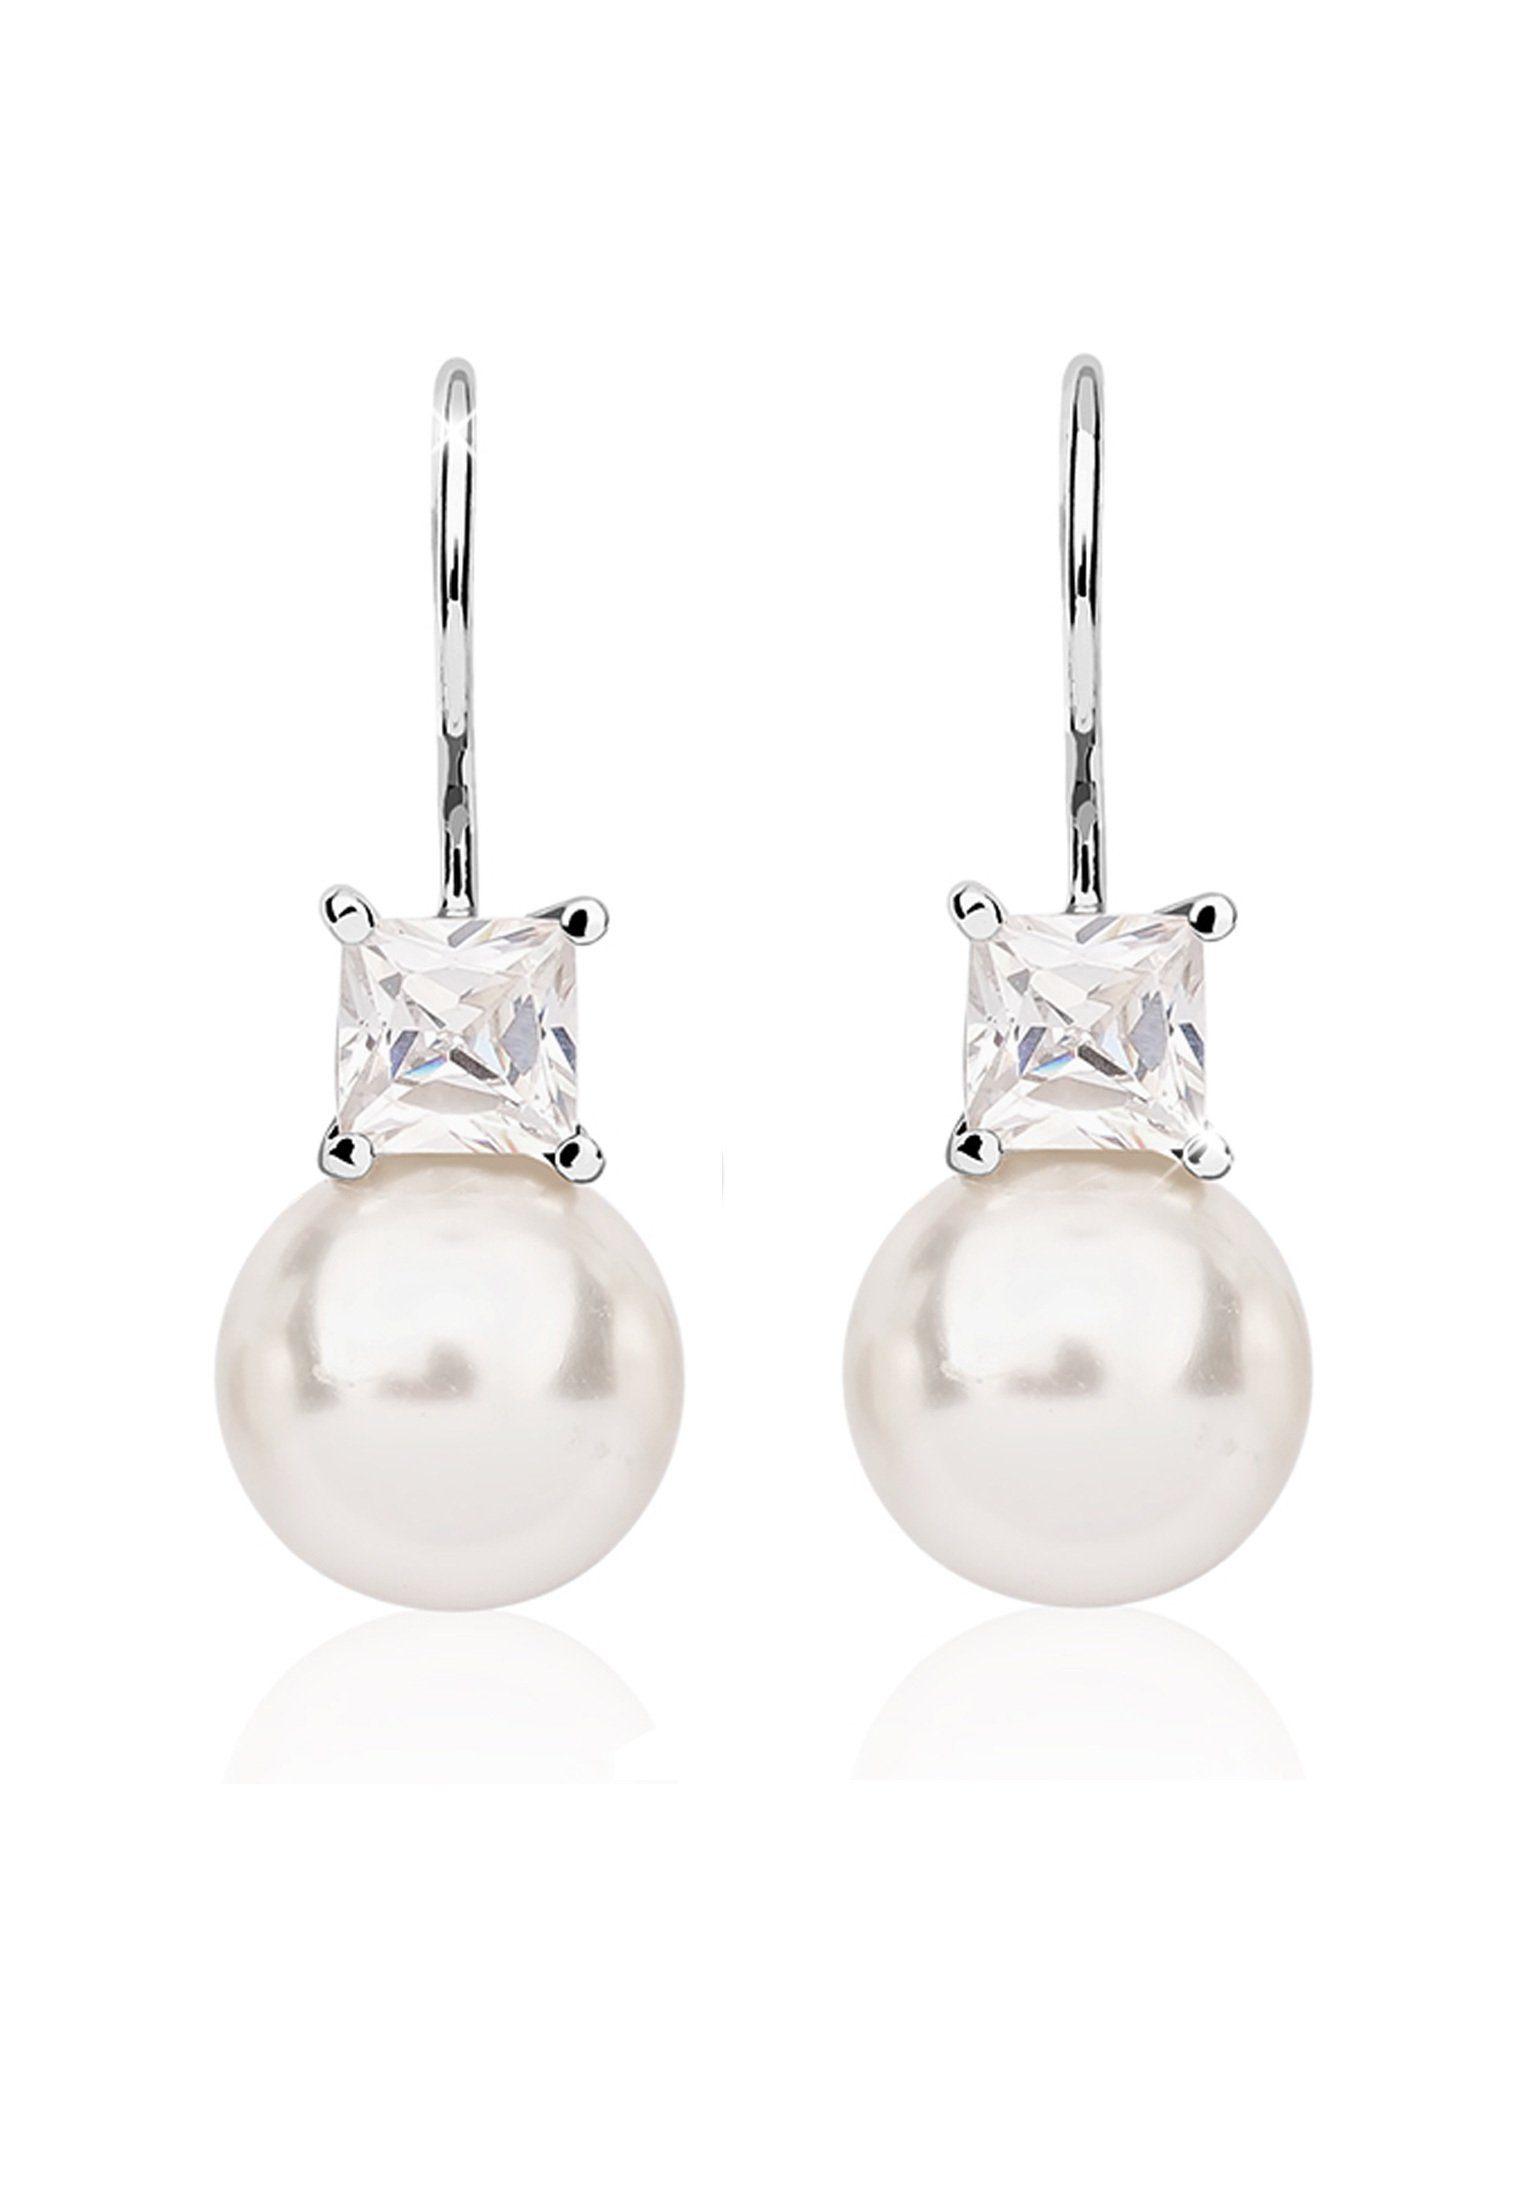 Nenalina Perlenohrringe »Perle Swarovski® Kristalle Zirkonia 925er Silber«